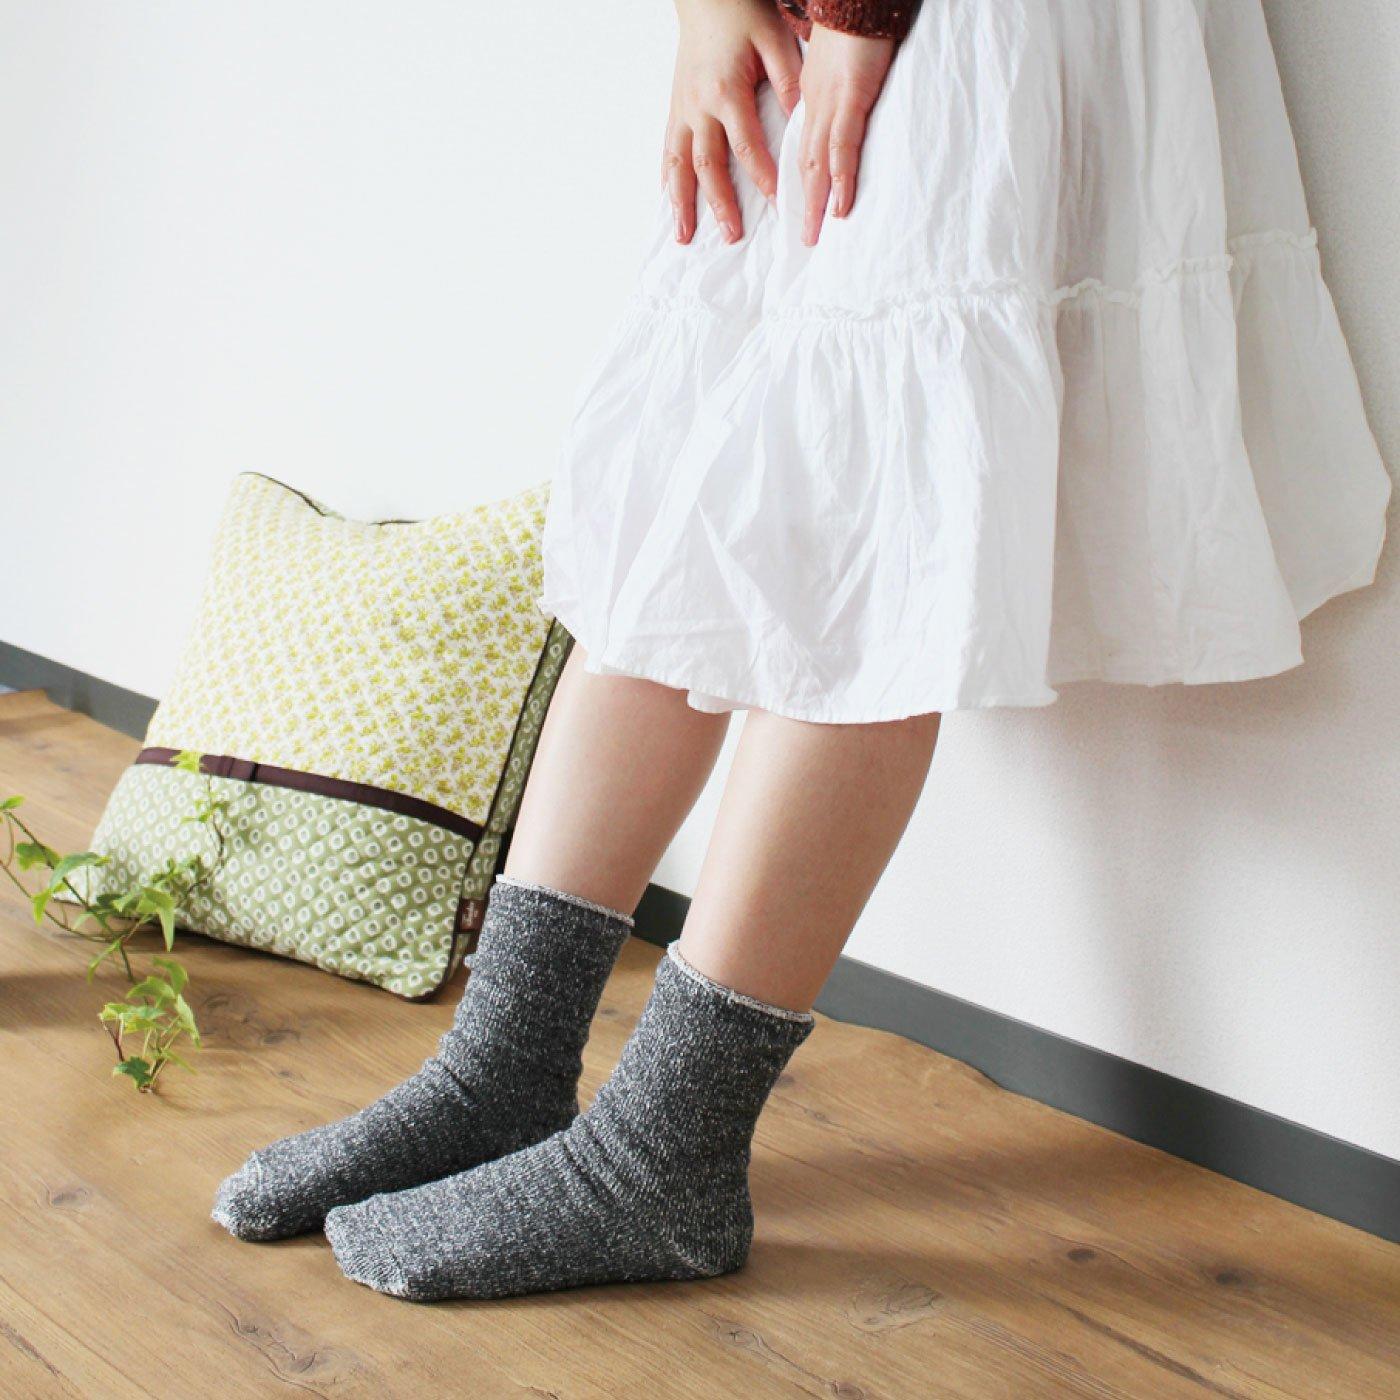 HIORIE 冷えとり用 内絹外ウール靴下2足セットの会